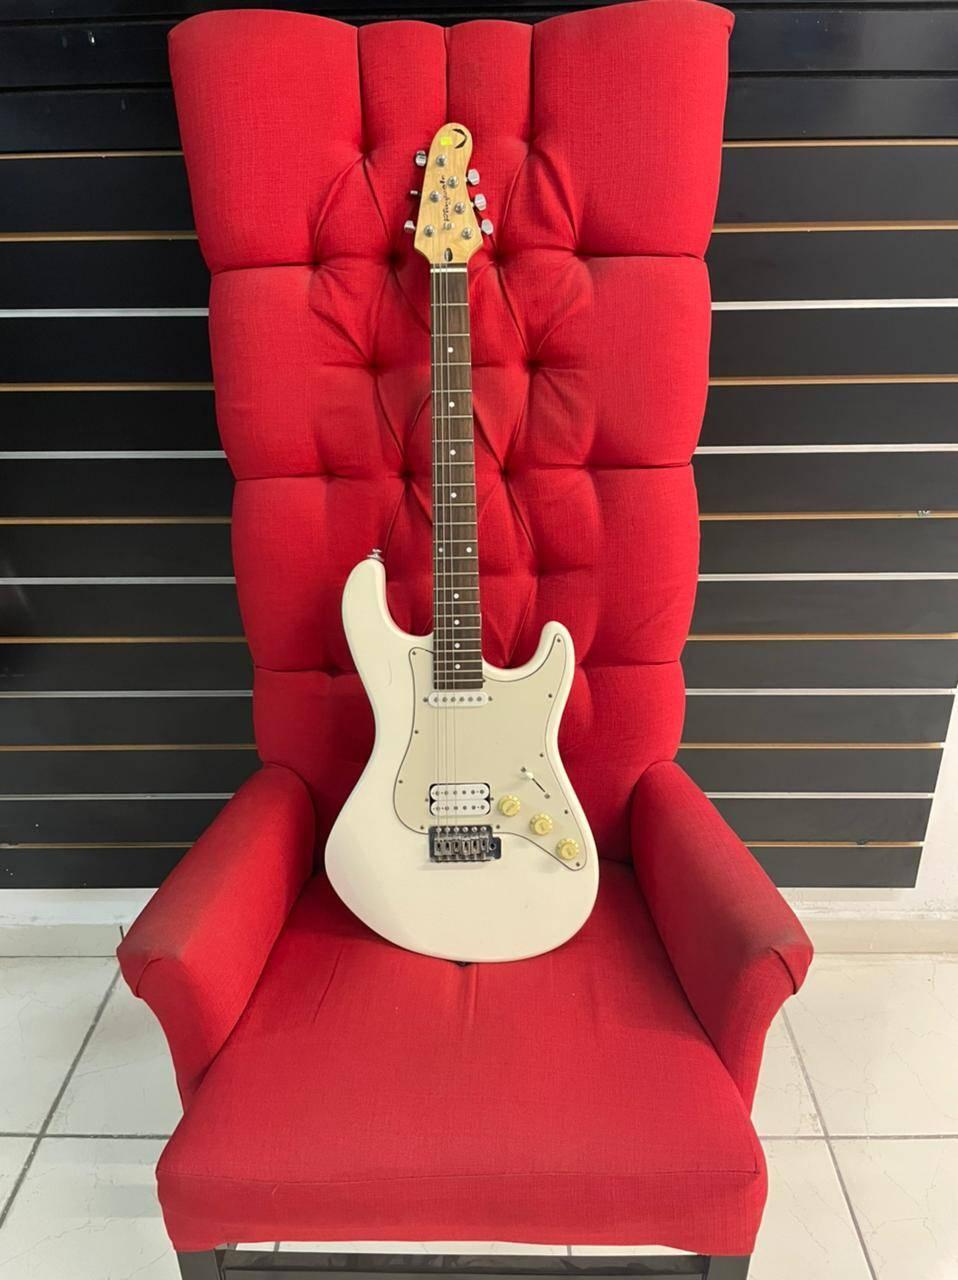 Guitarra Eléctrica Dean playmate Coror wh